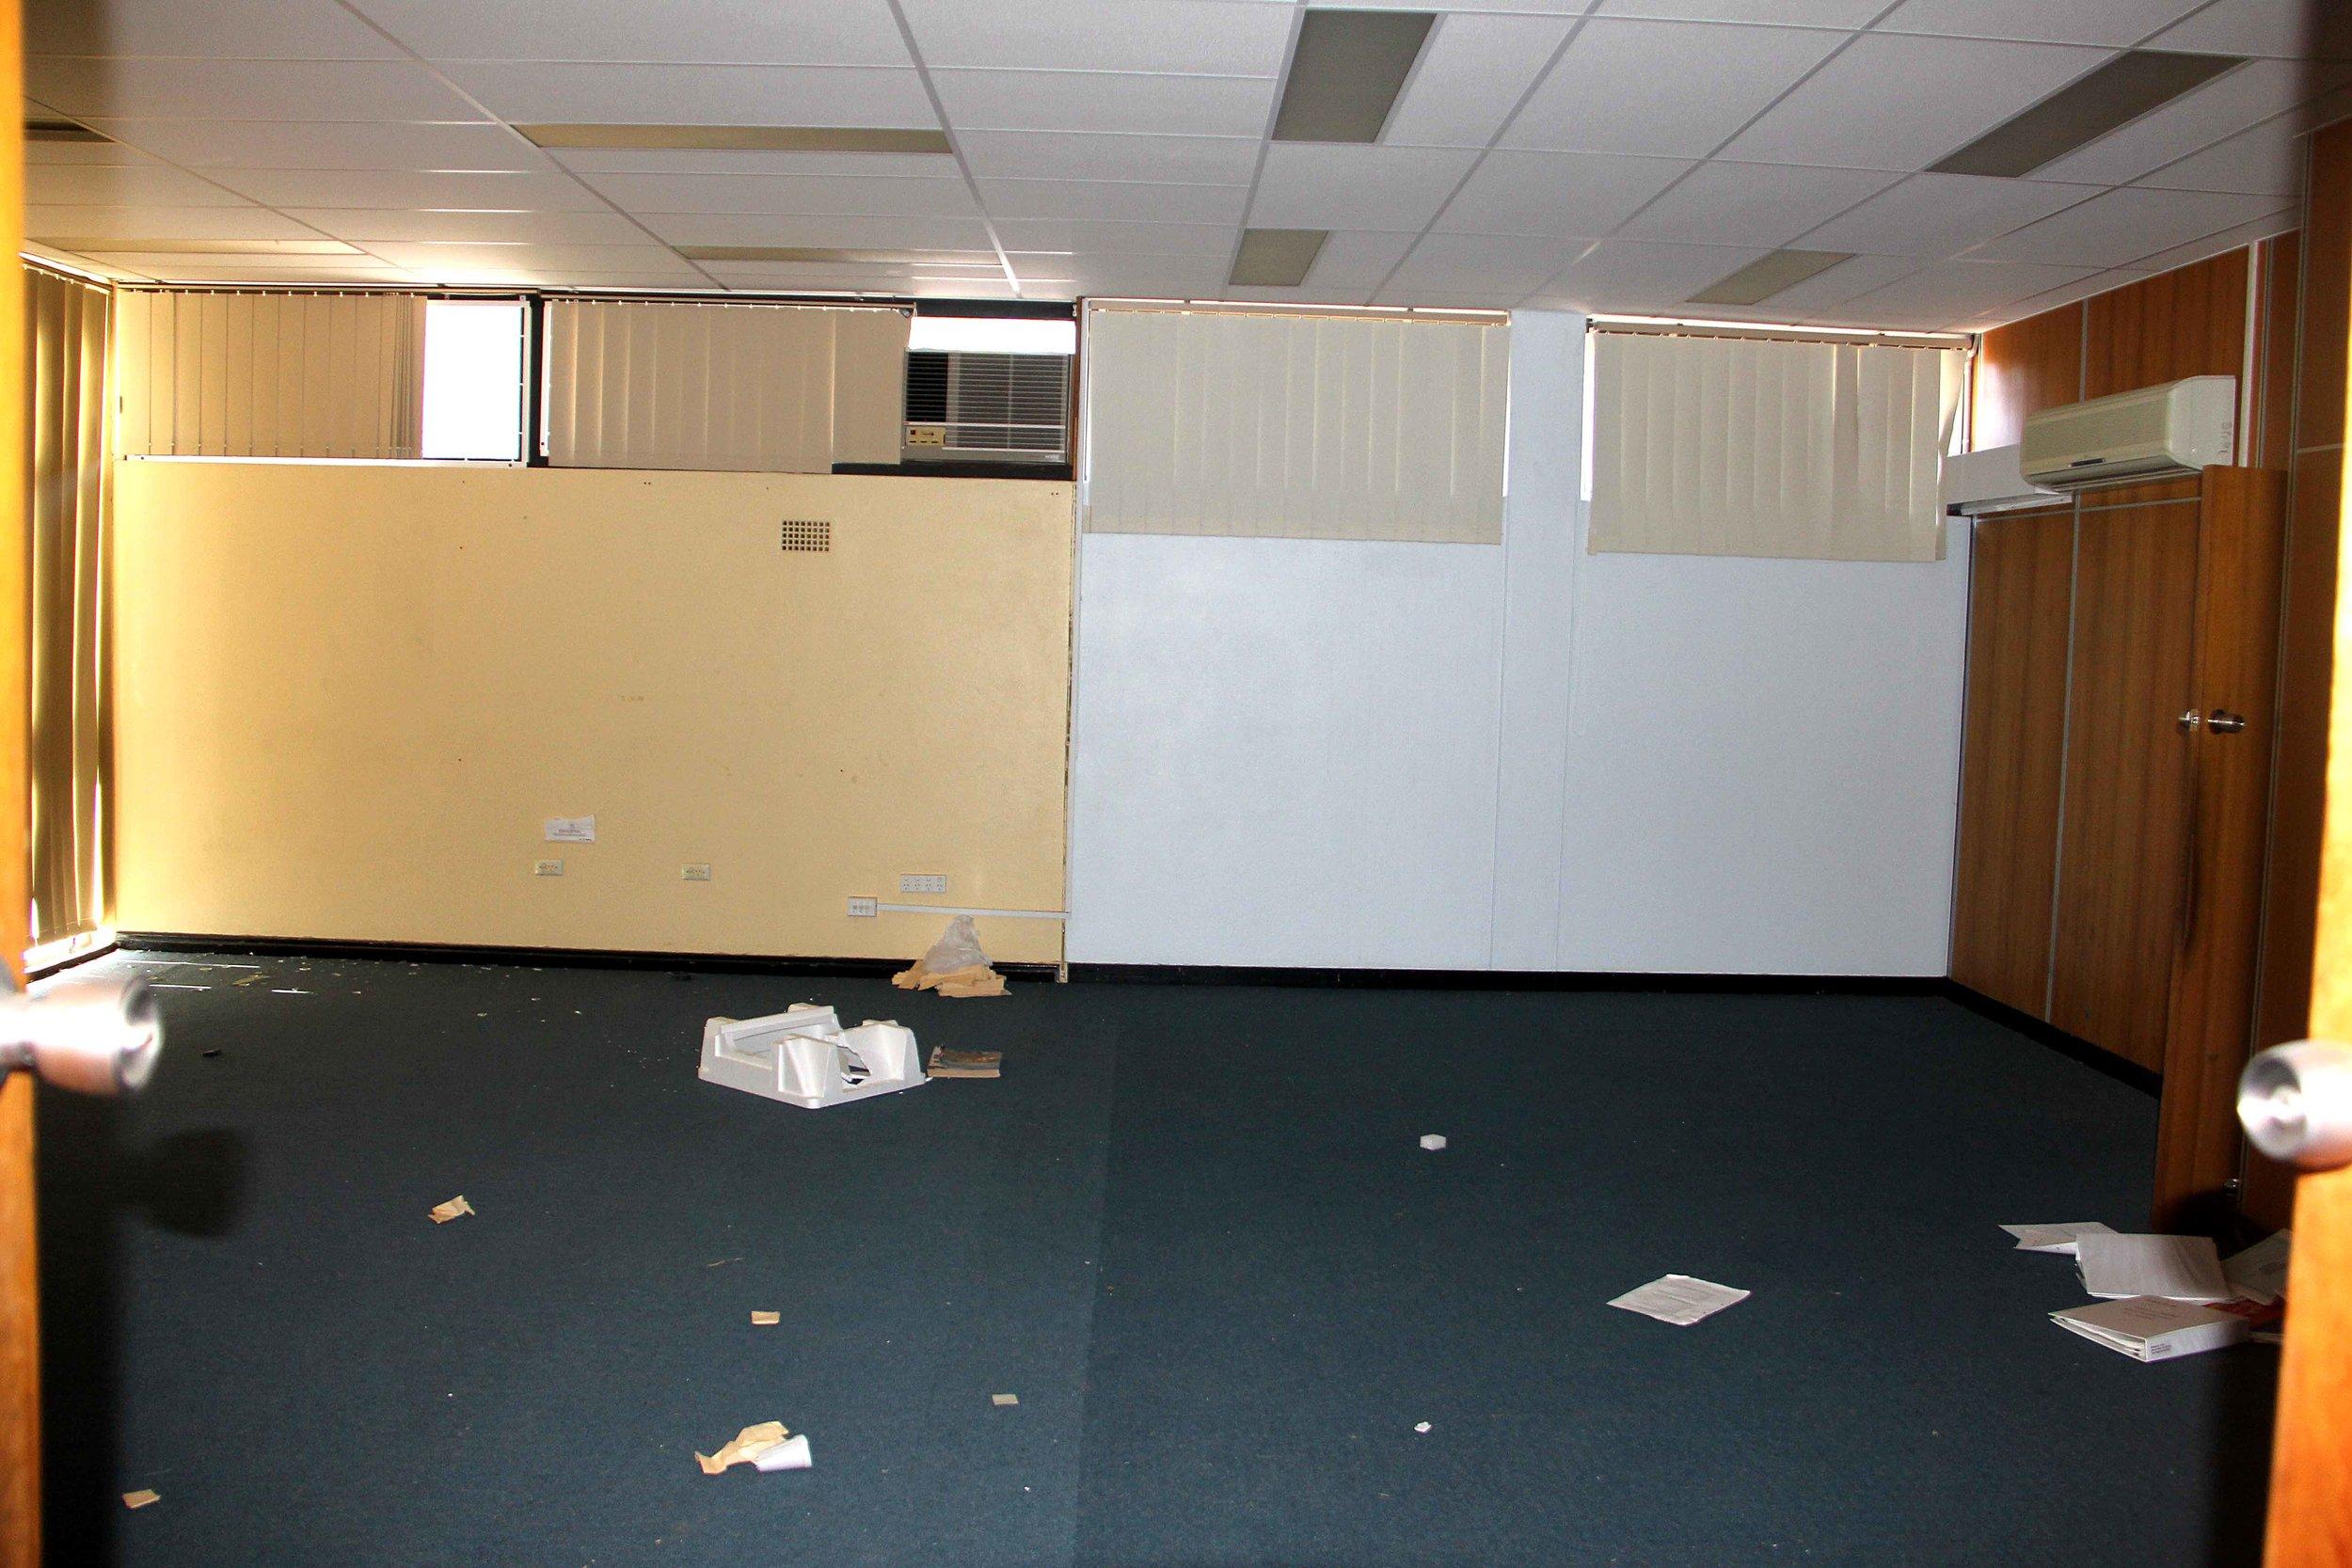 25 upstairs south office 1.jpg